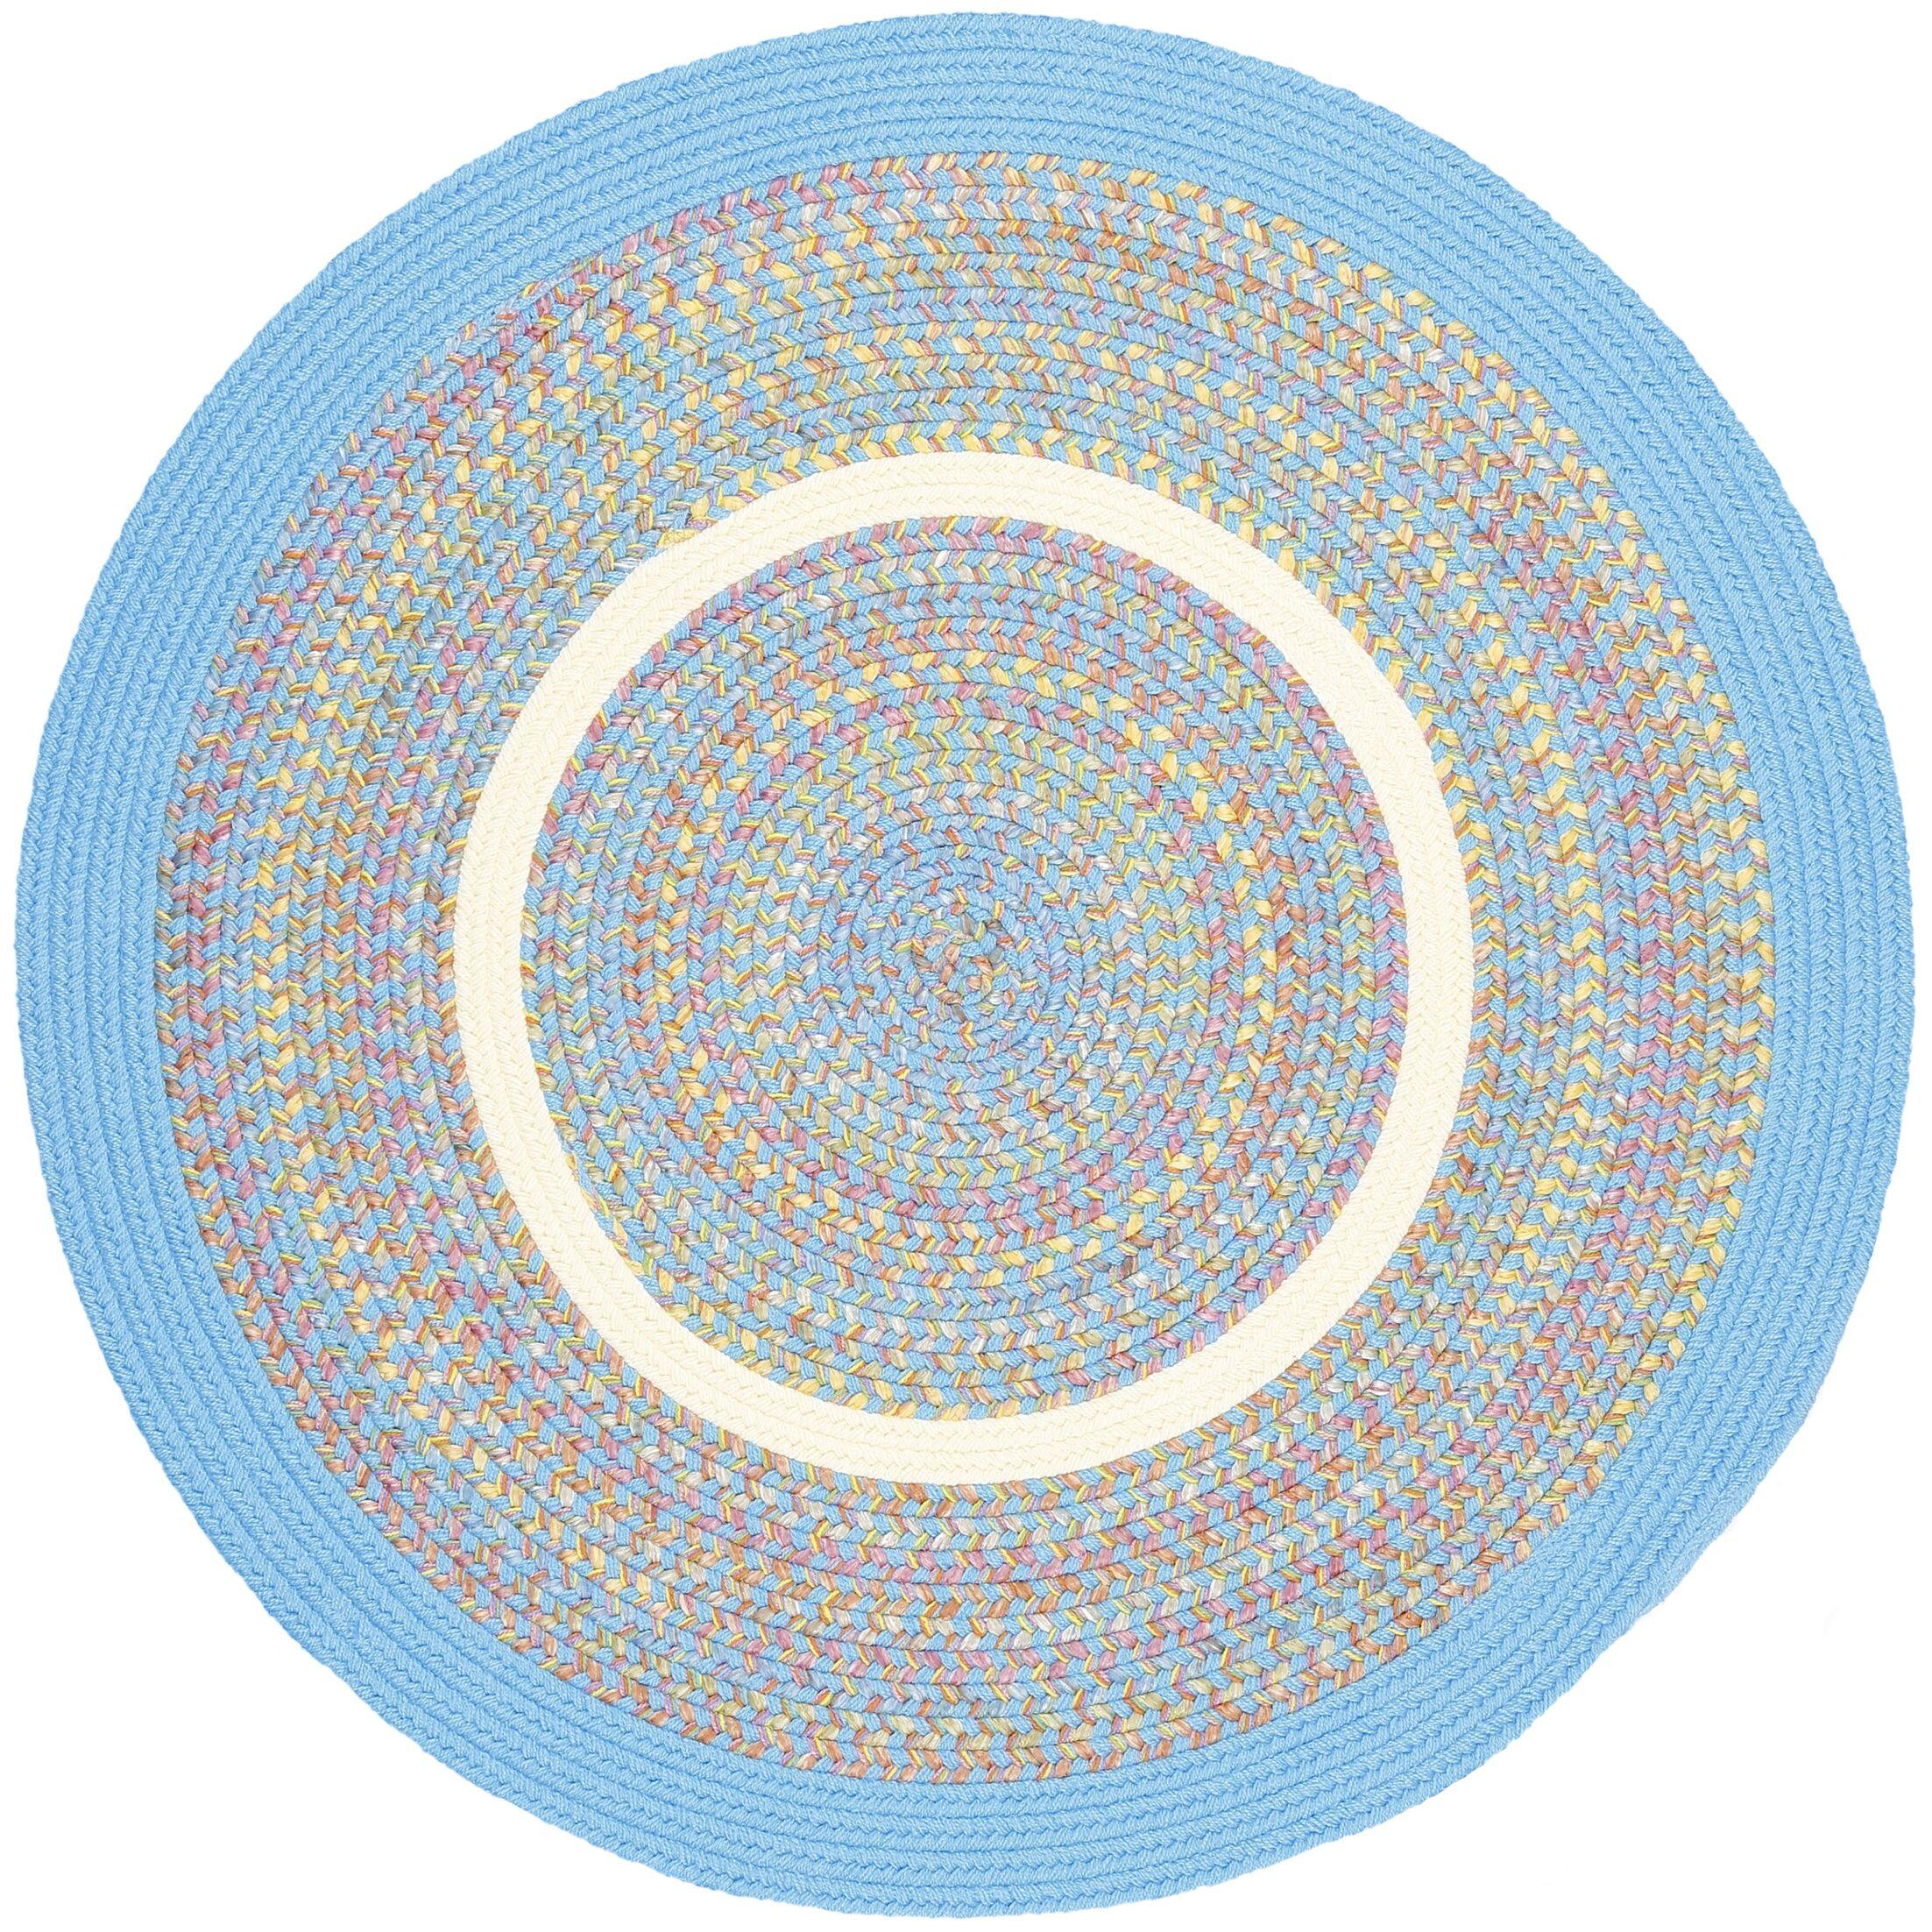 Sahaswan Blue Indoor/Outdoor Area Rug Rug Size: Round 8'